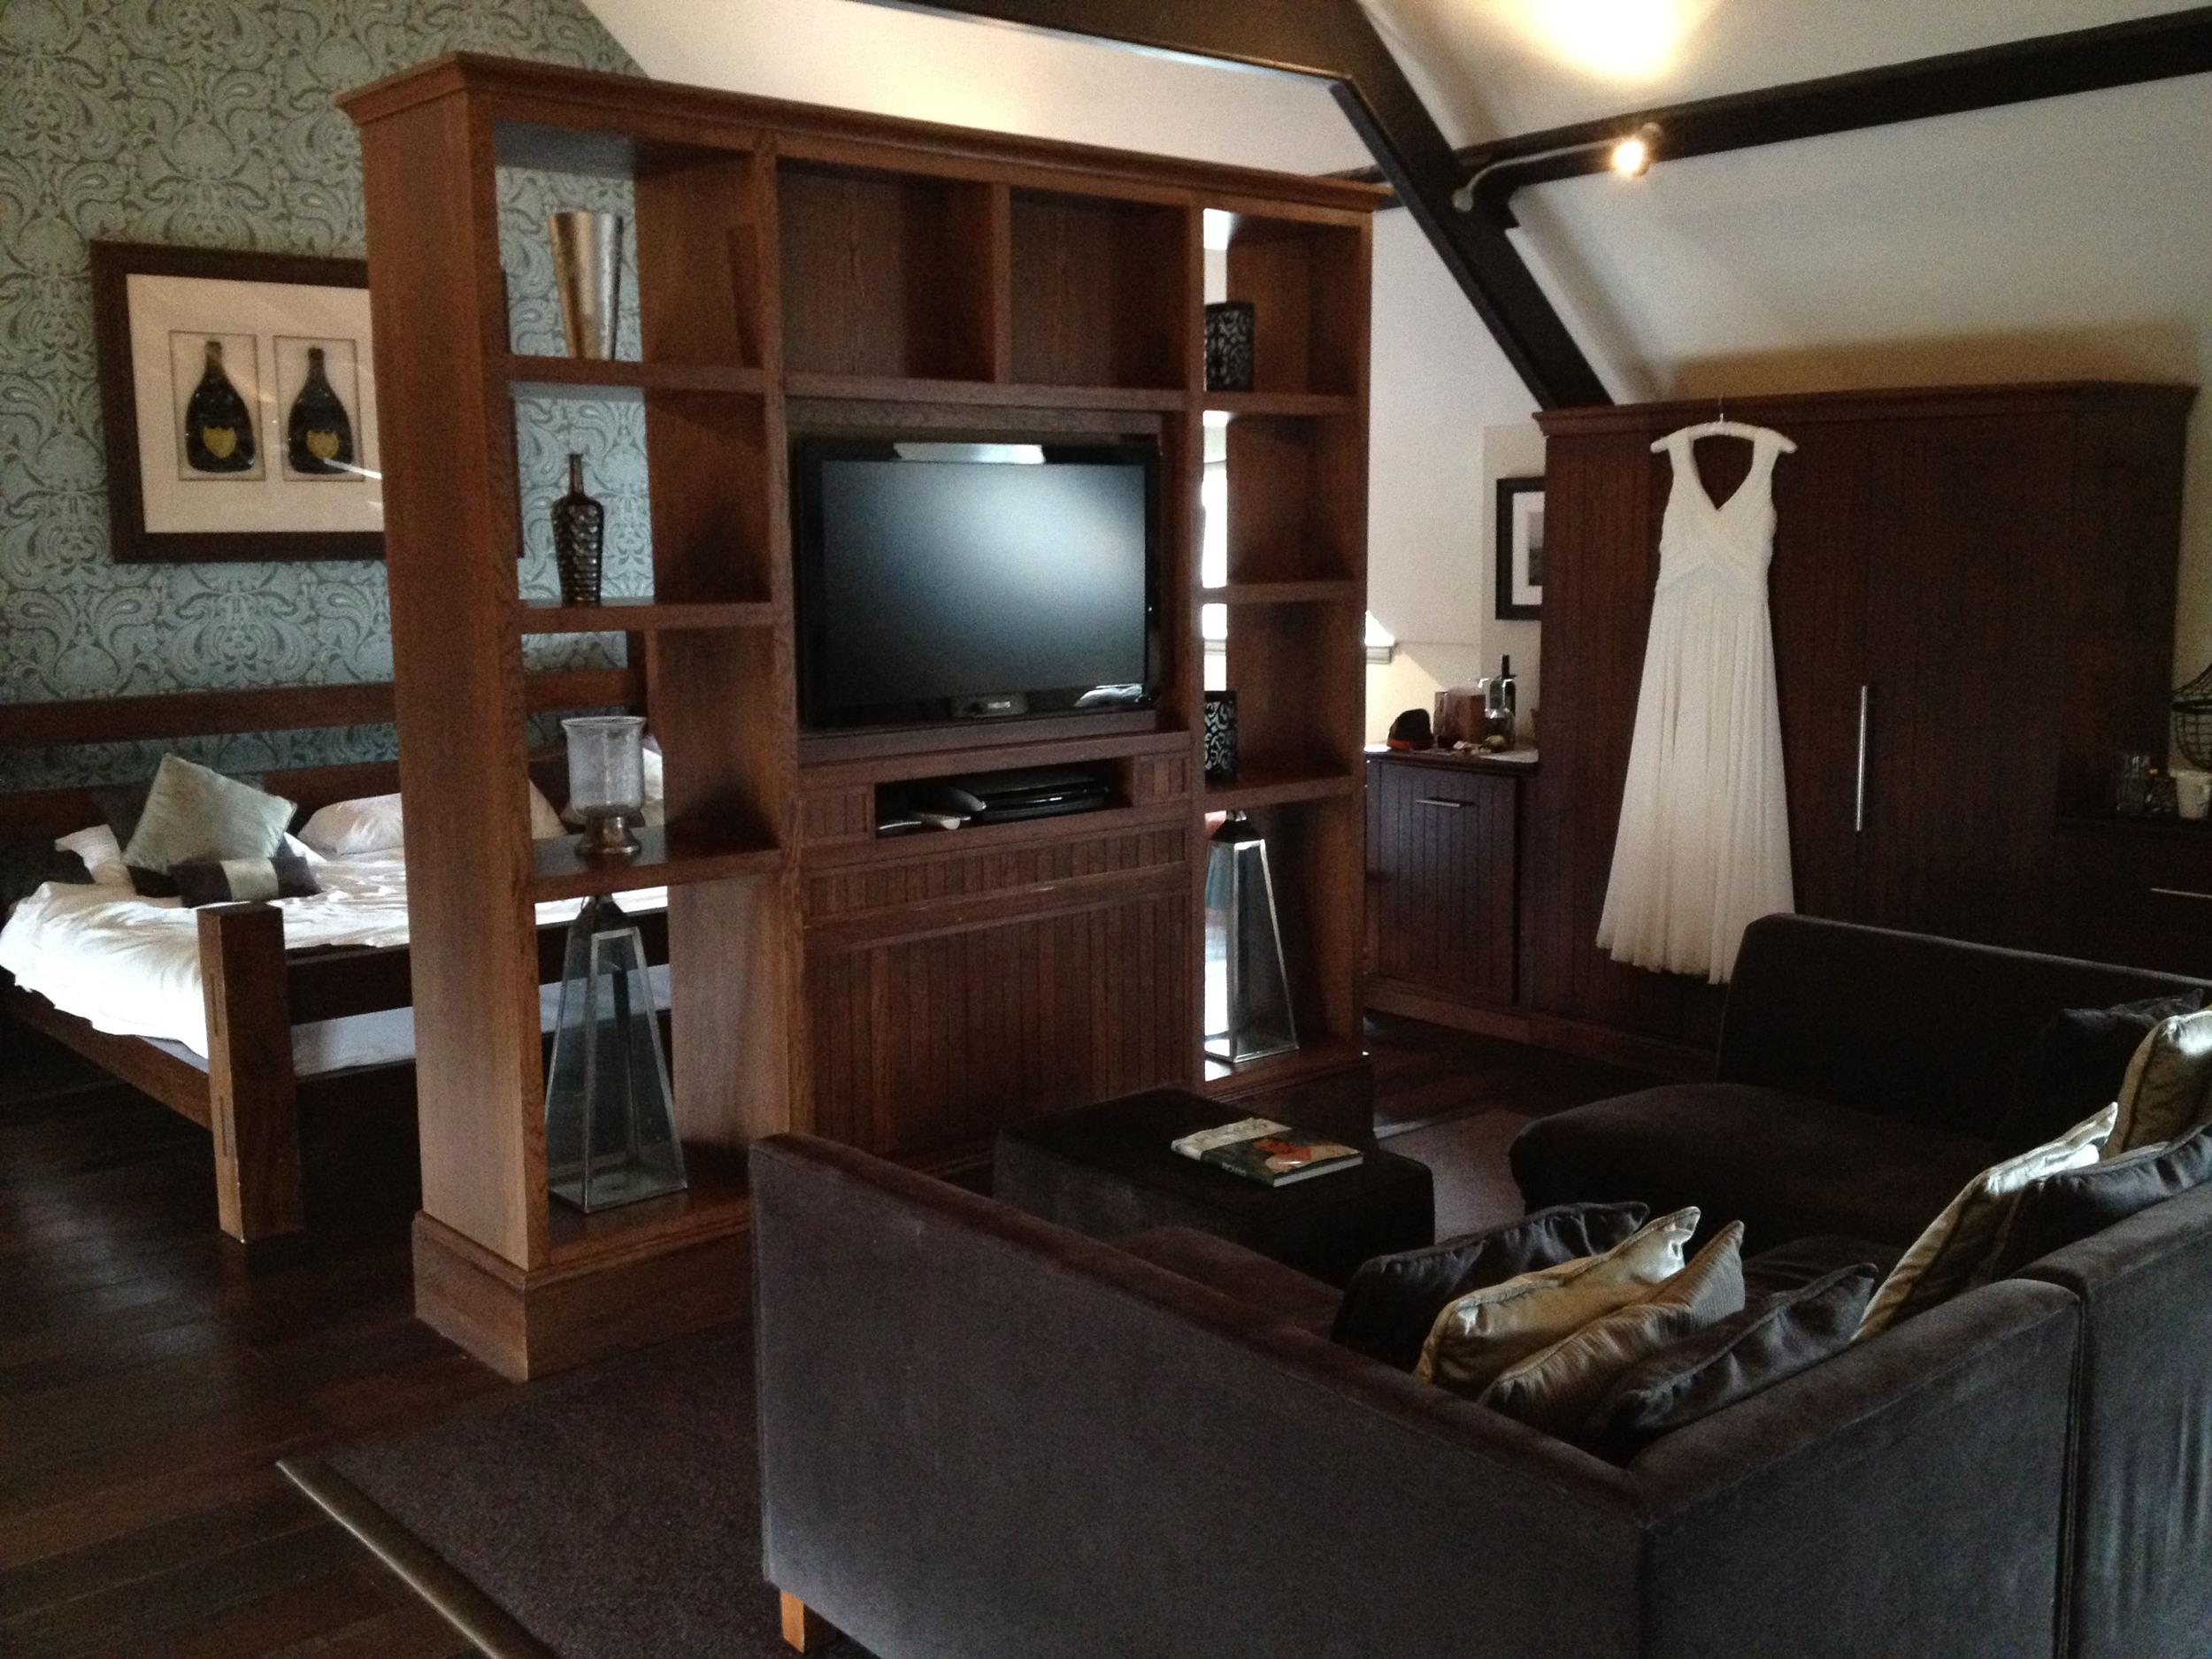 Dom Perignon suite at Hotel du Vin